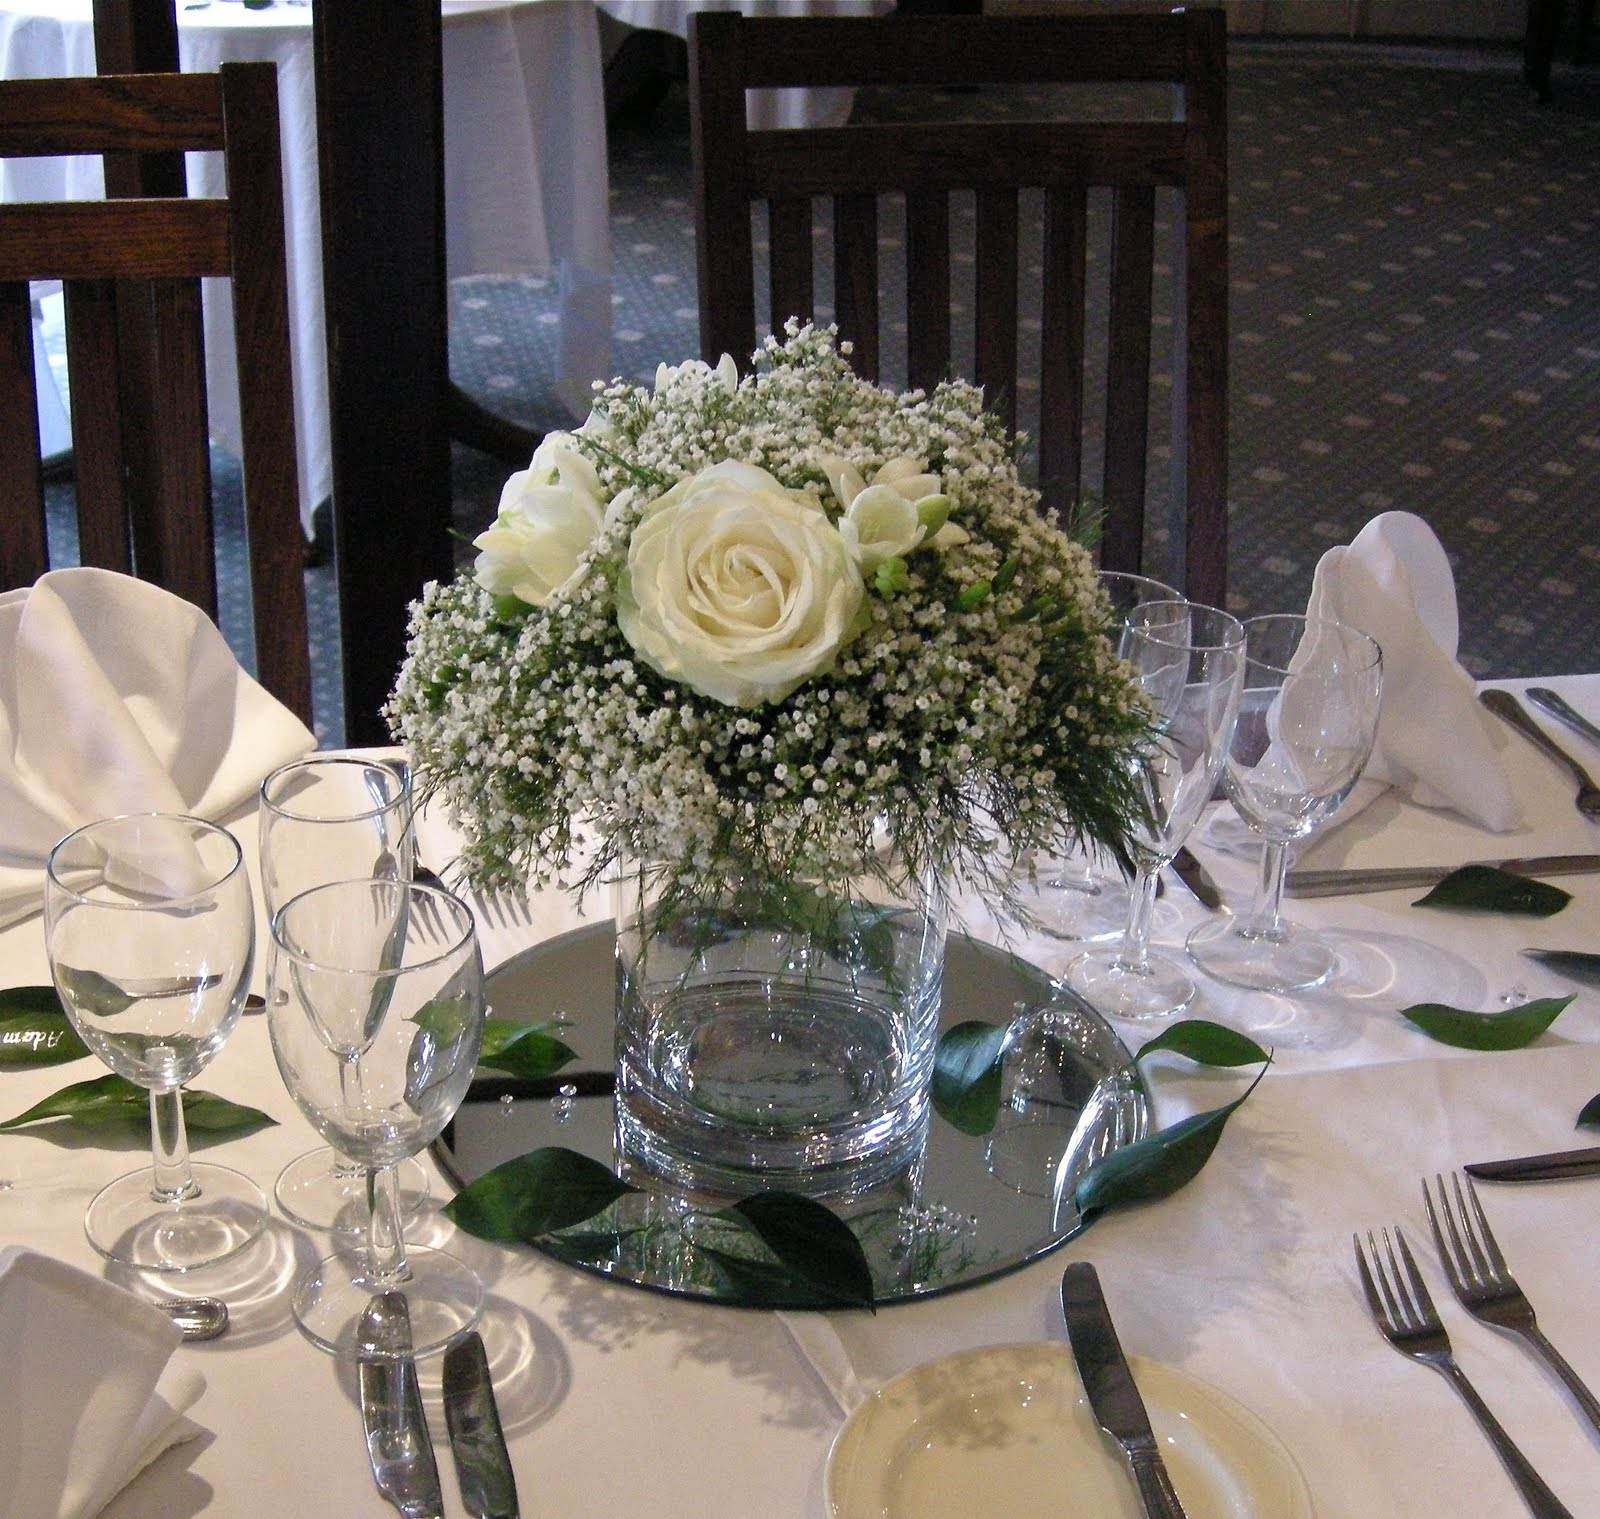 Flower Table Arrangements For Weddings: Wedding Flowers Blog: August 2011